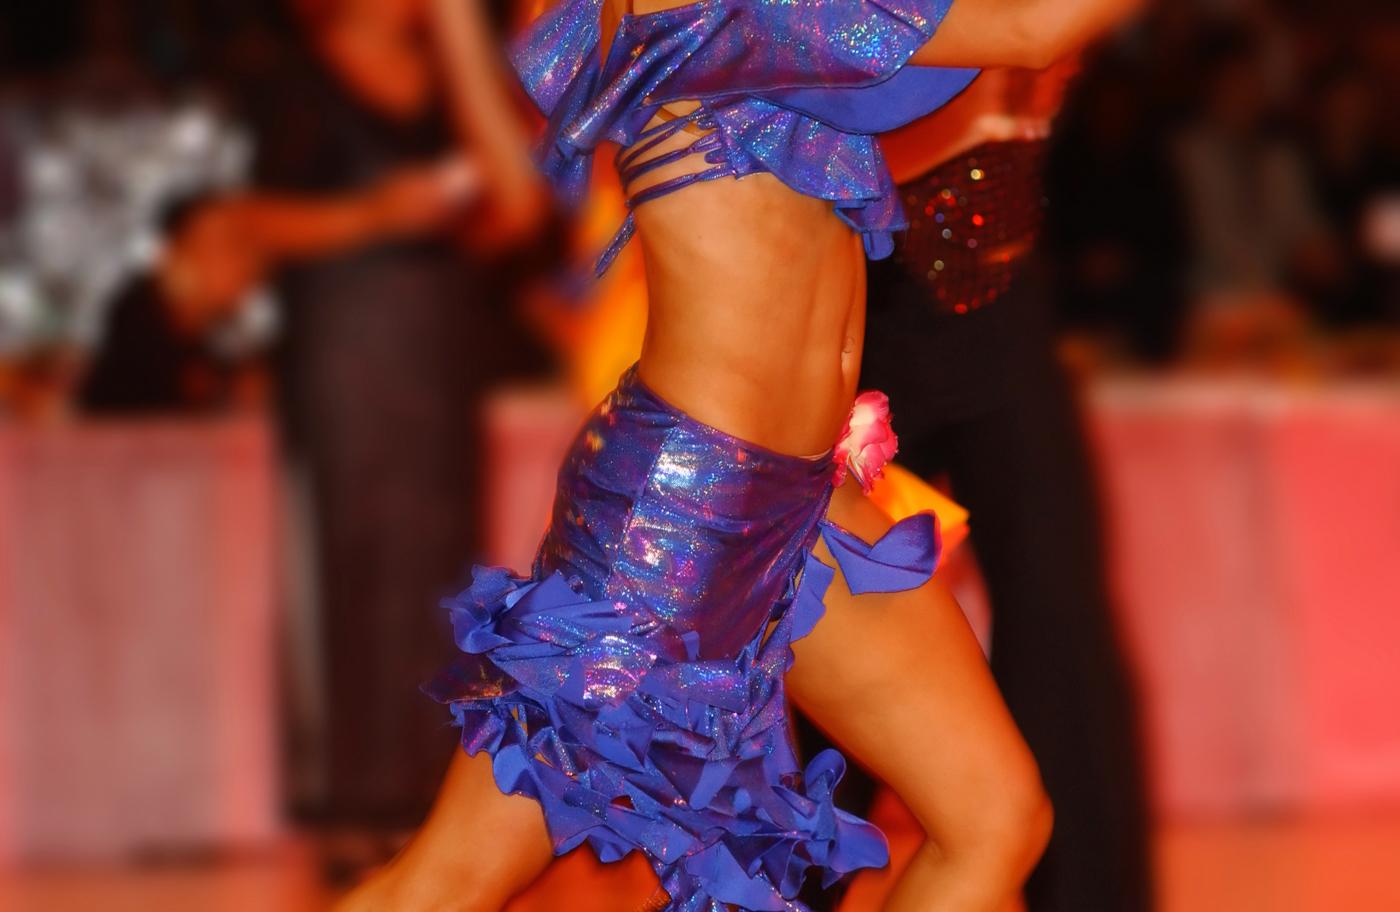 CUB14Cuba Salsa DancingFreeiStock000001057713